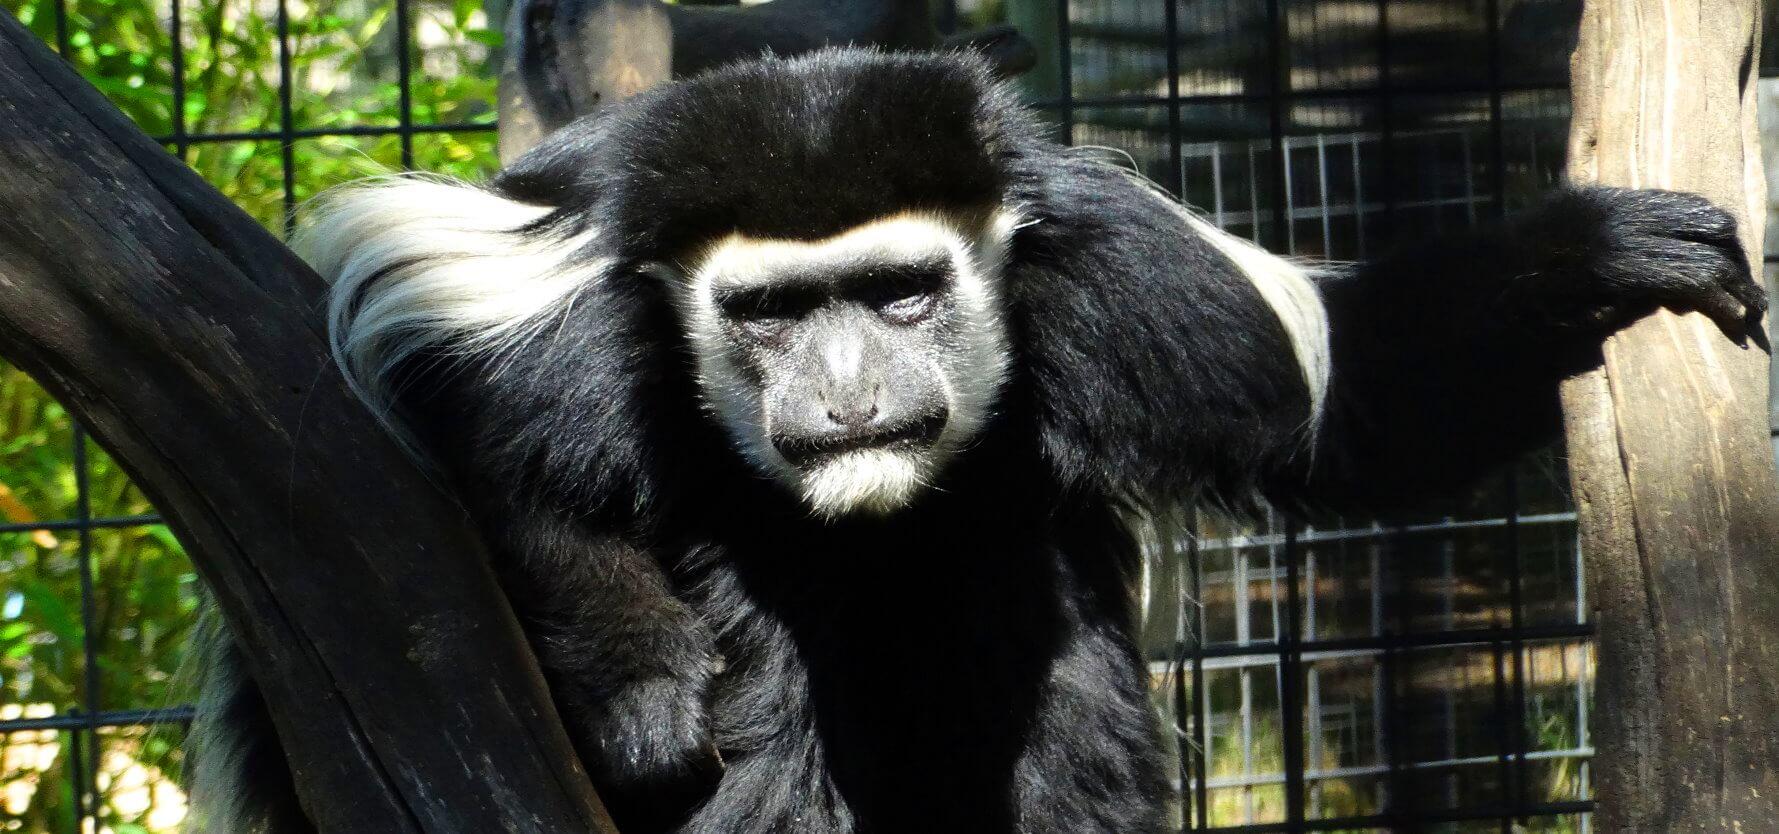 visit_safari_wild_animal_park_kids_friendly_adventures